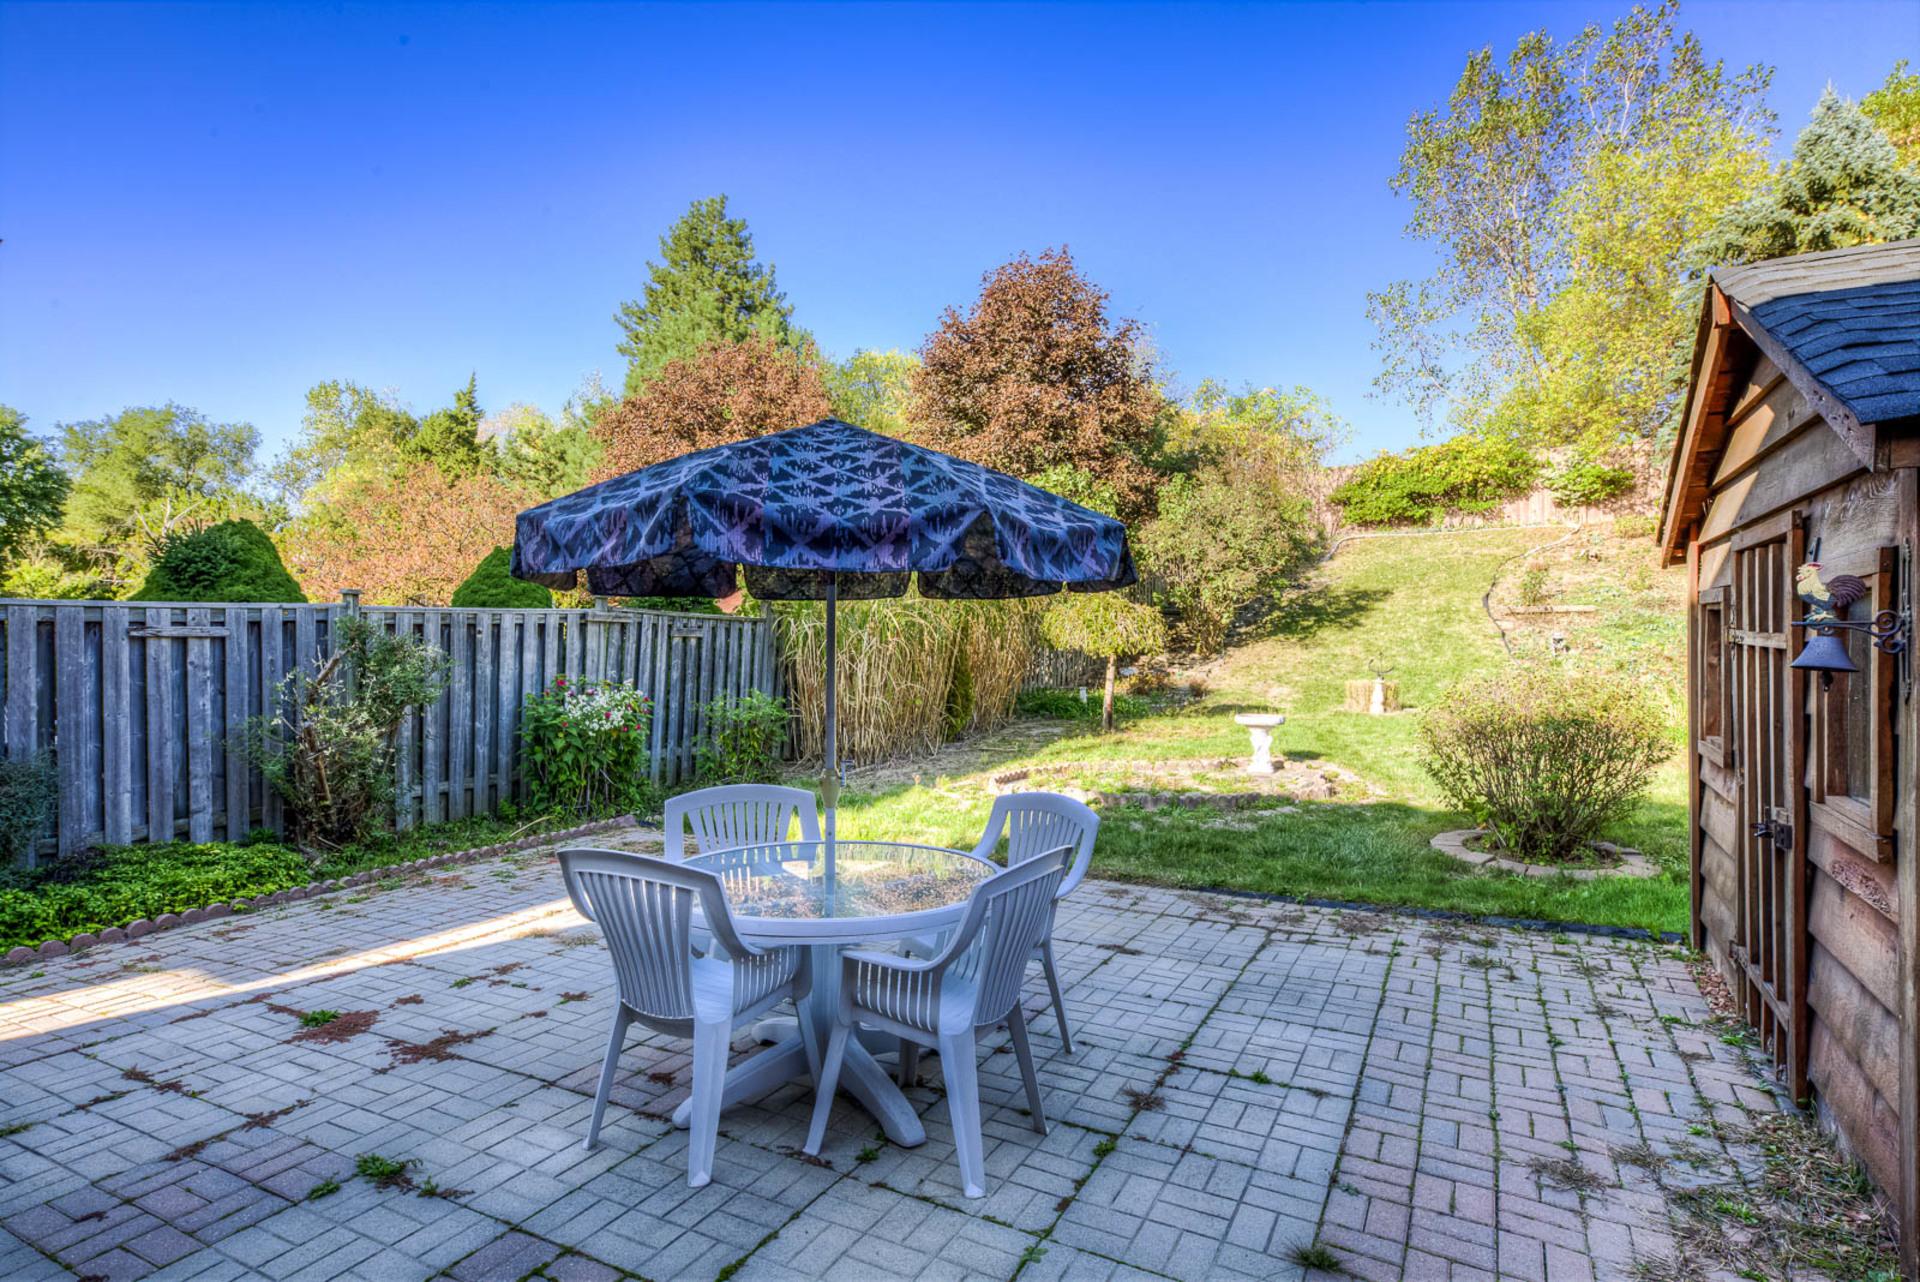 Backyard - 4230 Credit Pointe Drive, Mississauga - Elite3 & Team at 4230 Credit Pointe Drive, East Credit, Mississauga